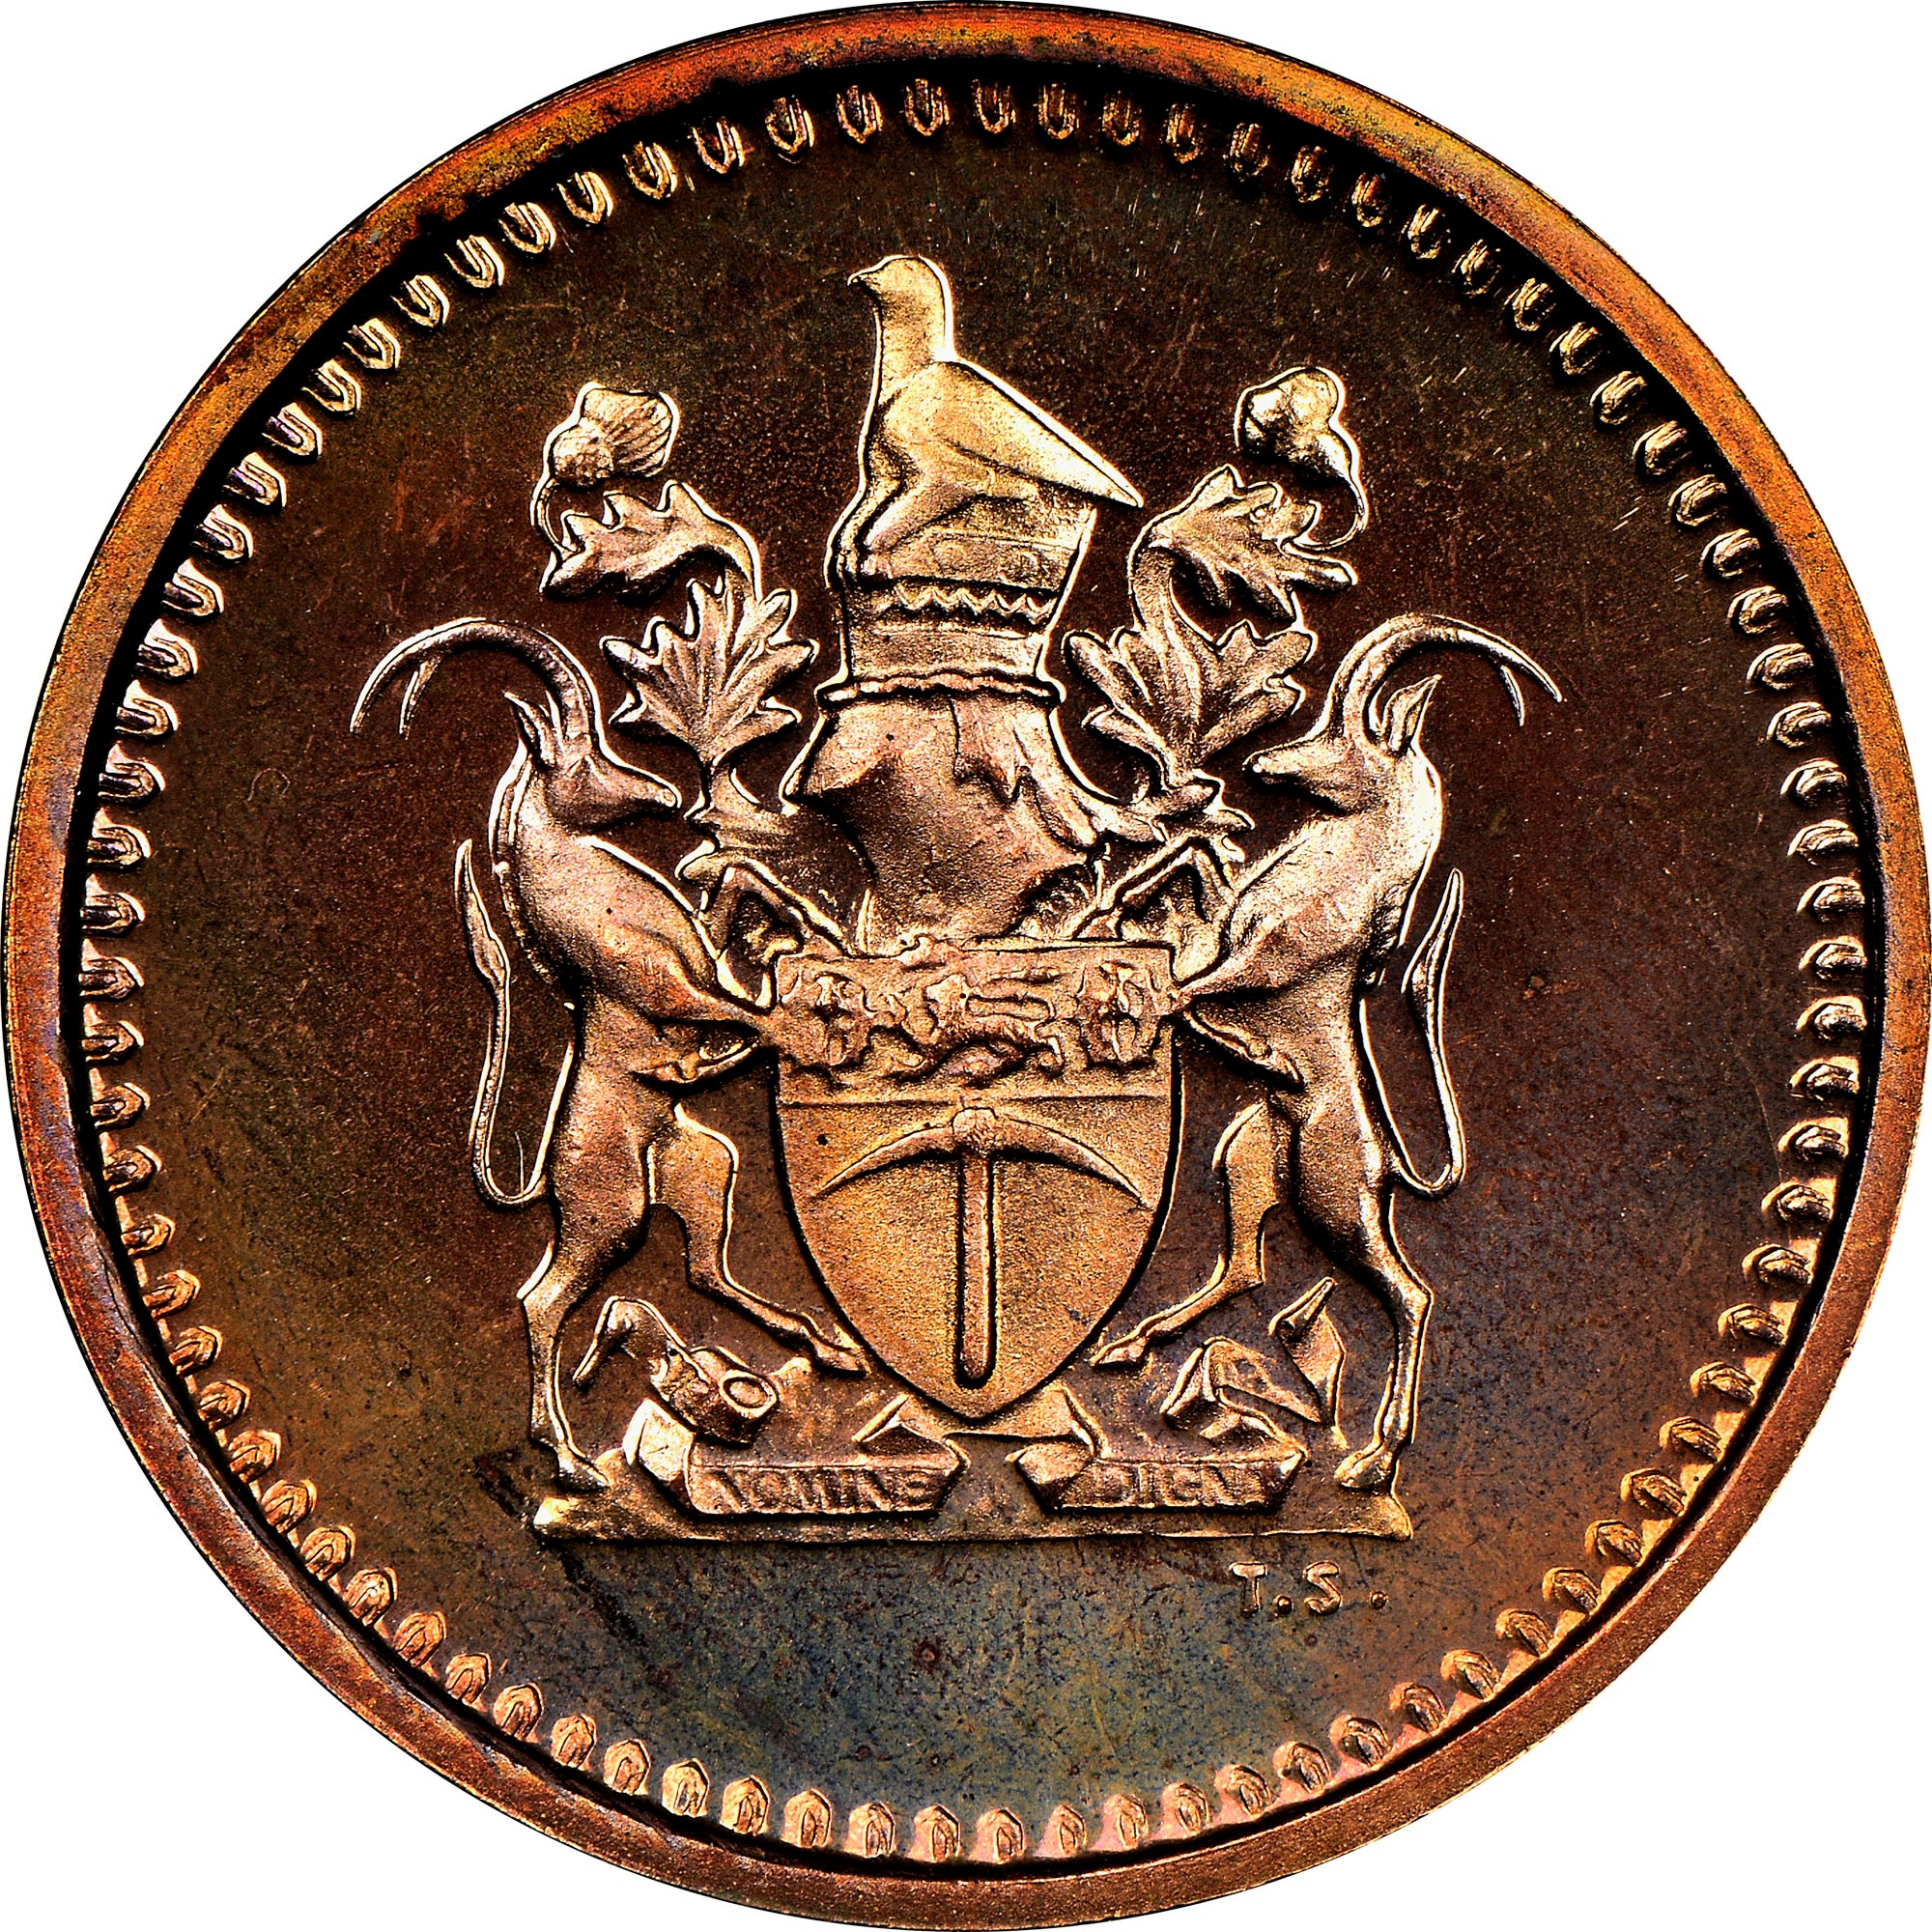 Rhodesia Cent reverse